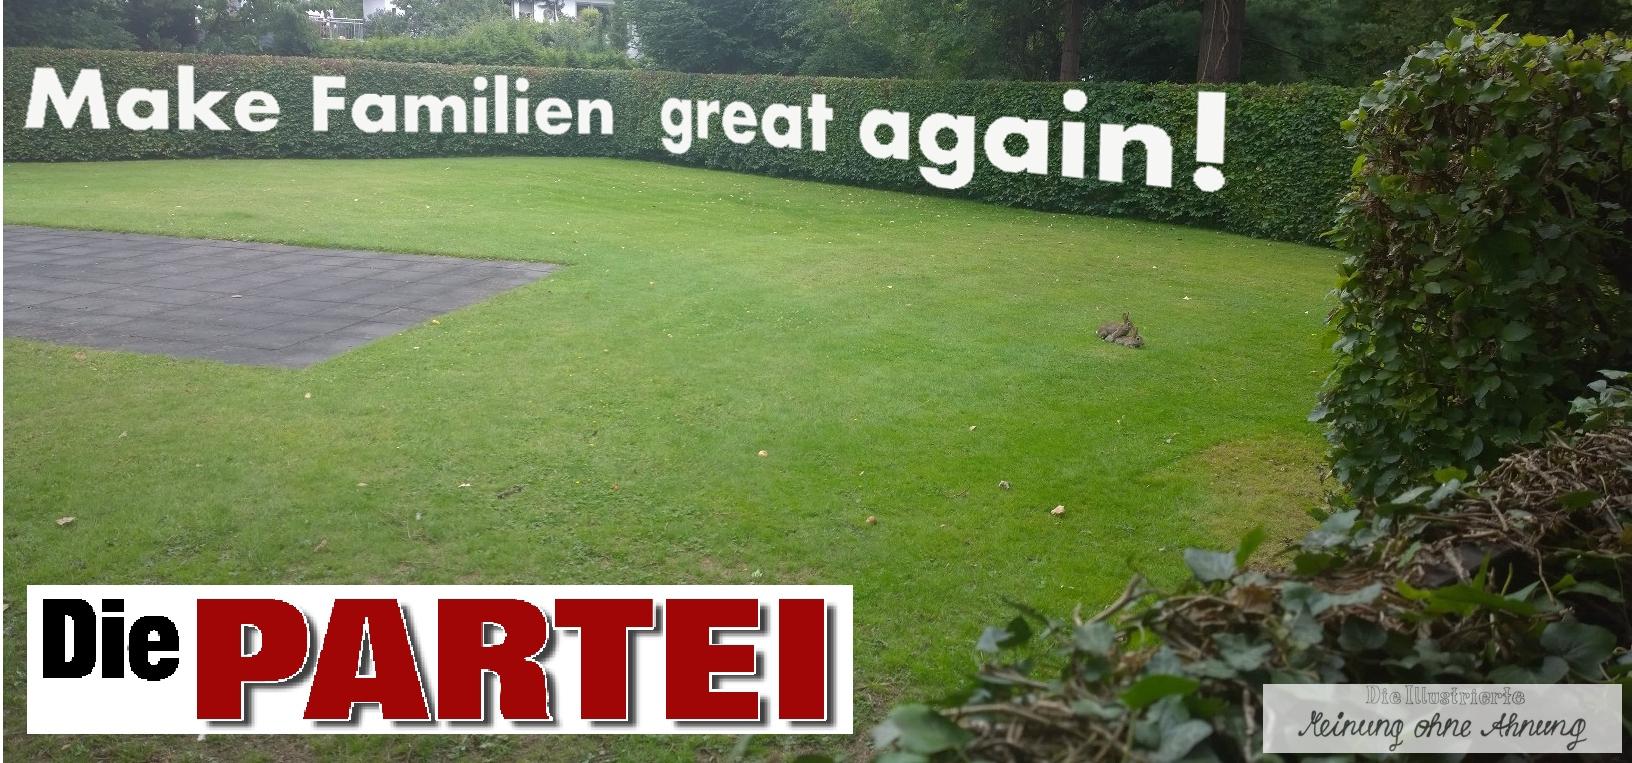 Make-Familien-great-again-Die-Partei